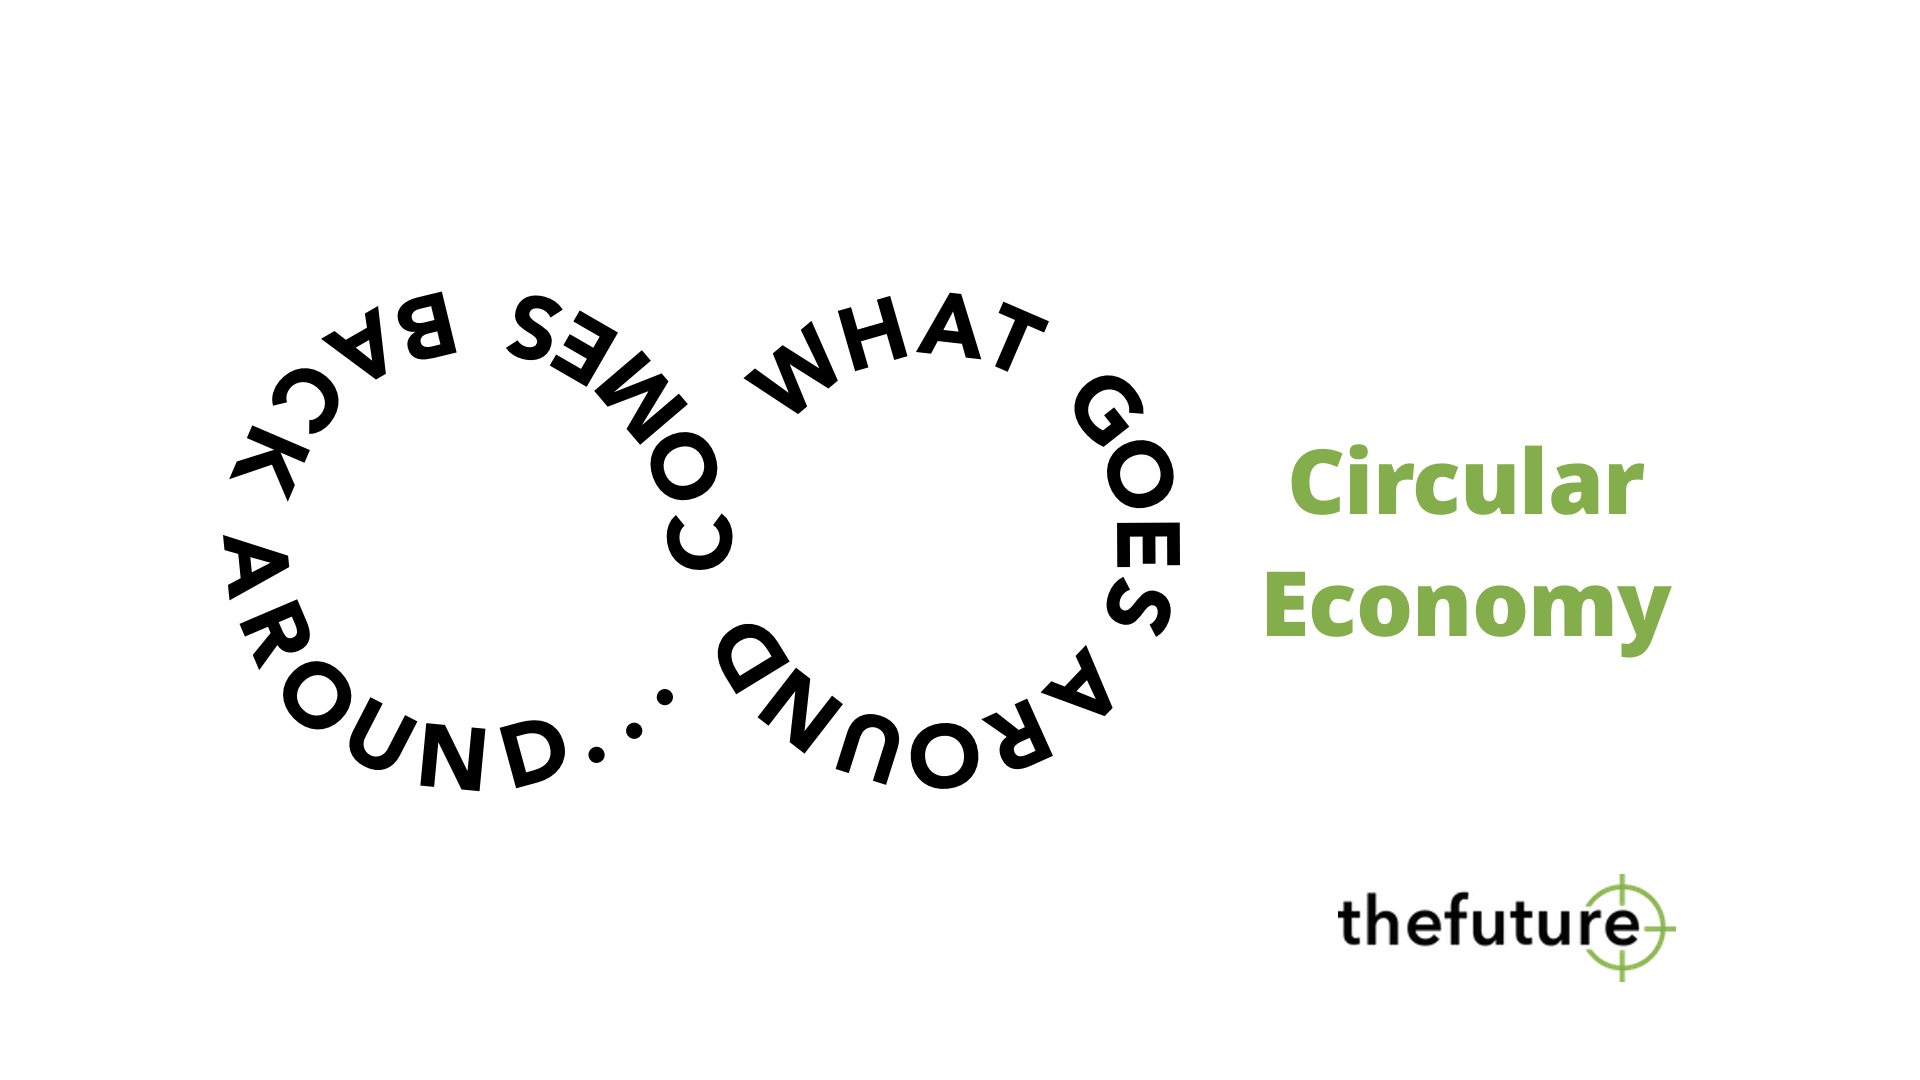 thefuture, Resurser, Cirkulär-Ekonomi, FB